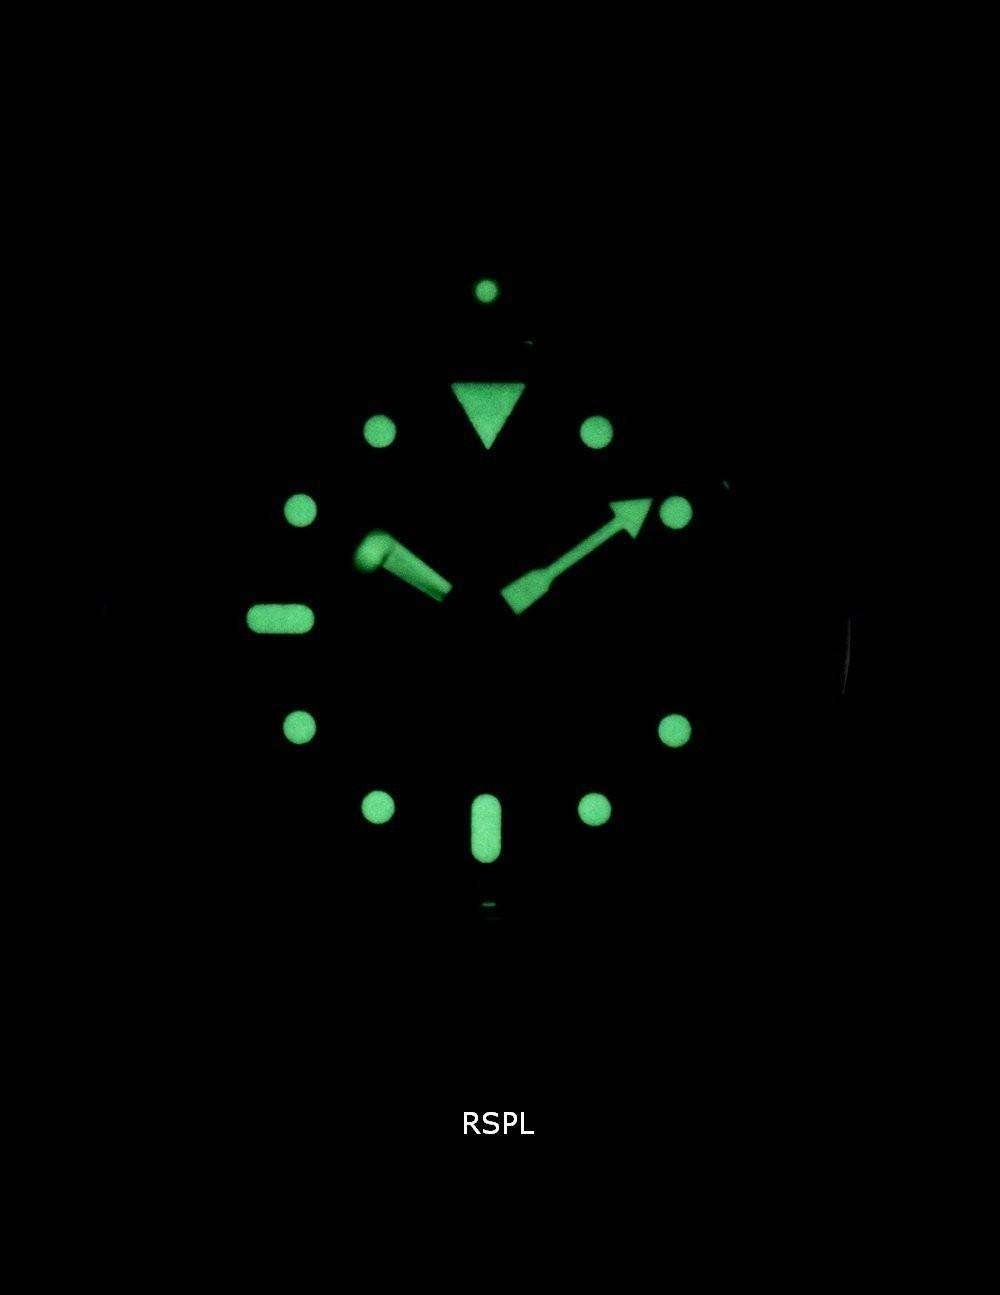 Seiko Automatic Diver's Ratio Dark Brown Leather SKX009J1-LS11 200M Men's Watch